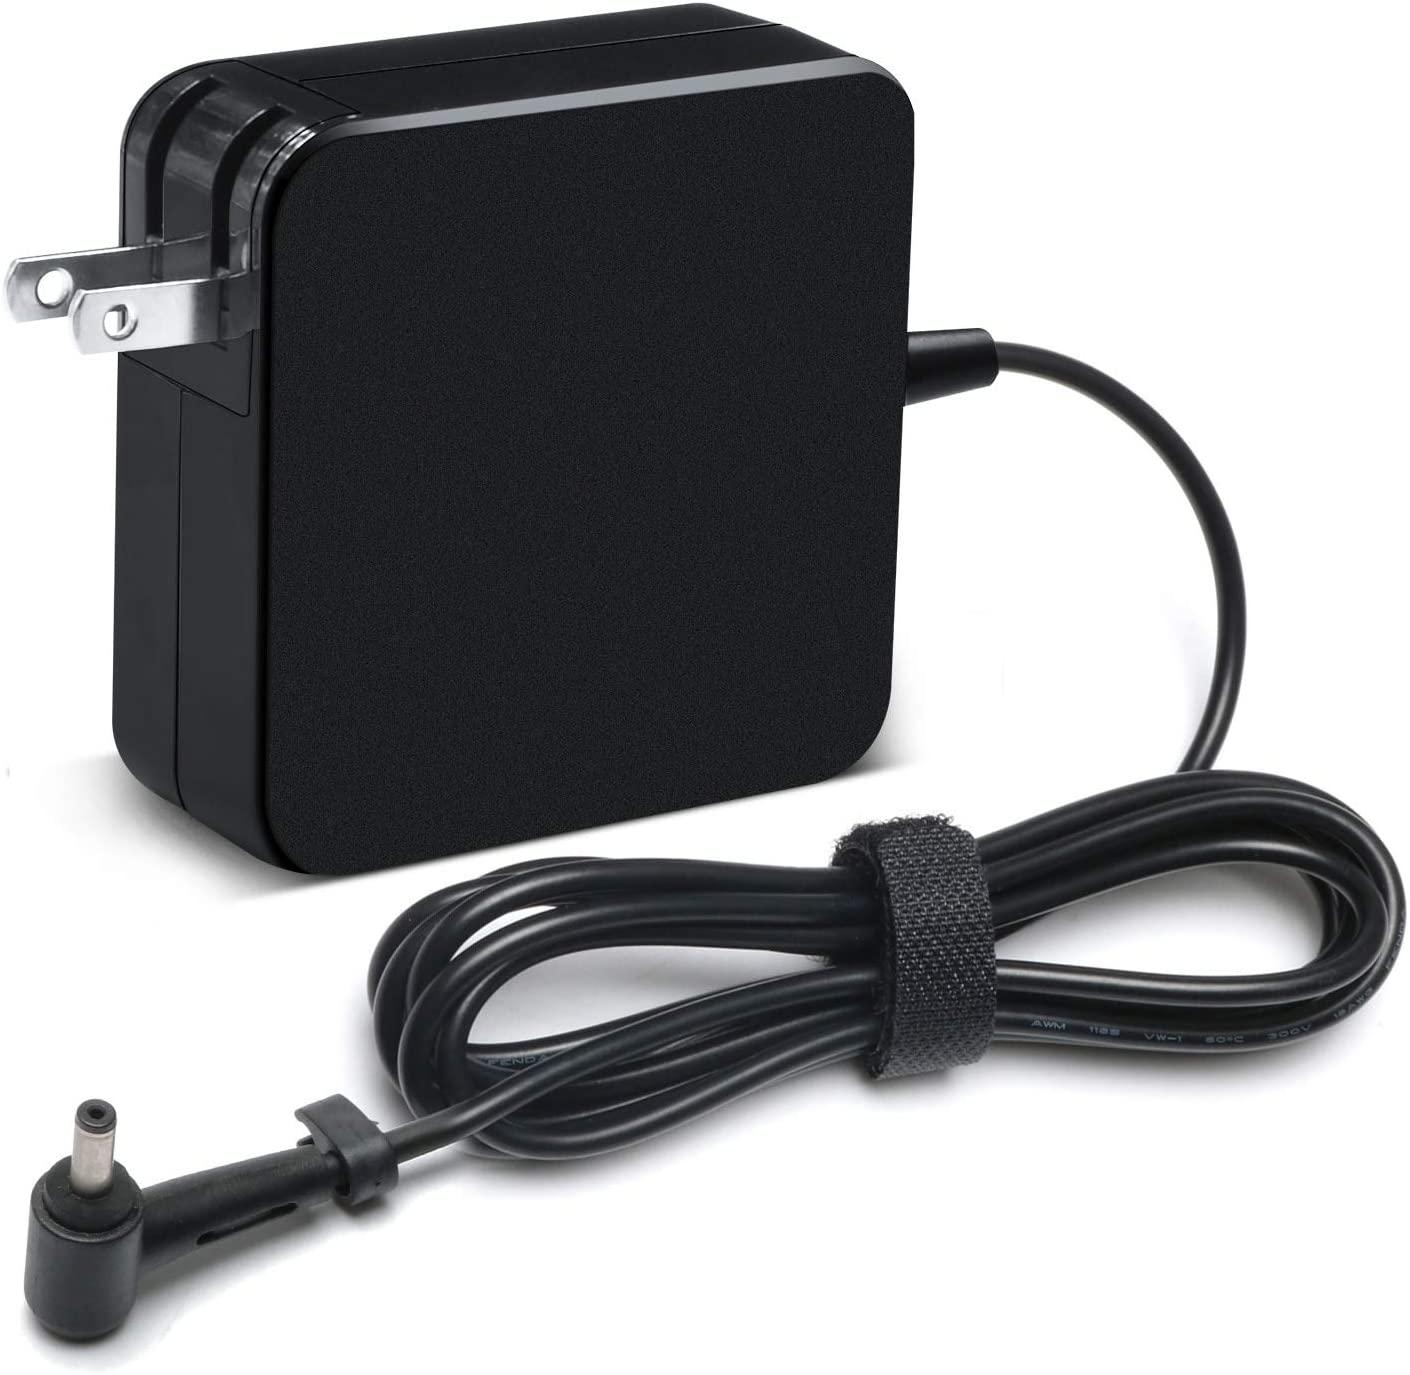 45W Laptop Notebook Charger for Asus UX303U UX360C UX305F Q504U Q302L Q504UA Q304U X553M X201E X202E X541NA X542UA X540S X540SA X541N C202SA C300SA E402WA Series